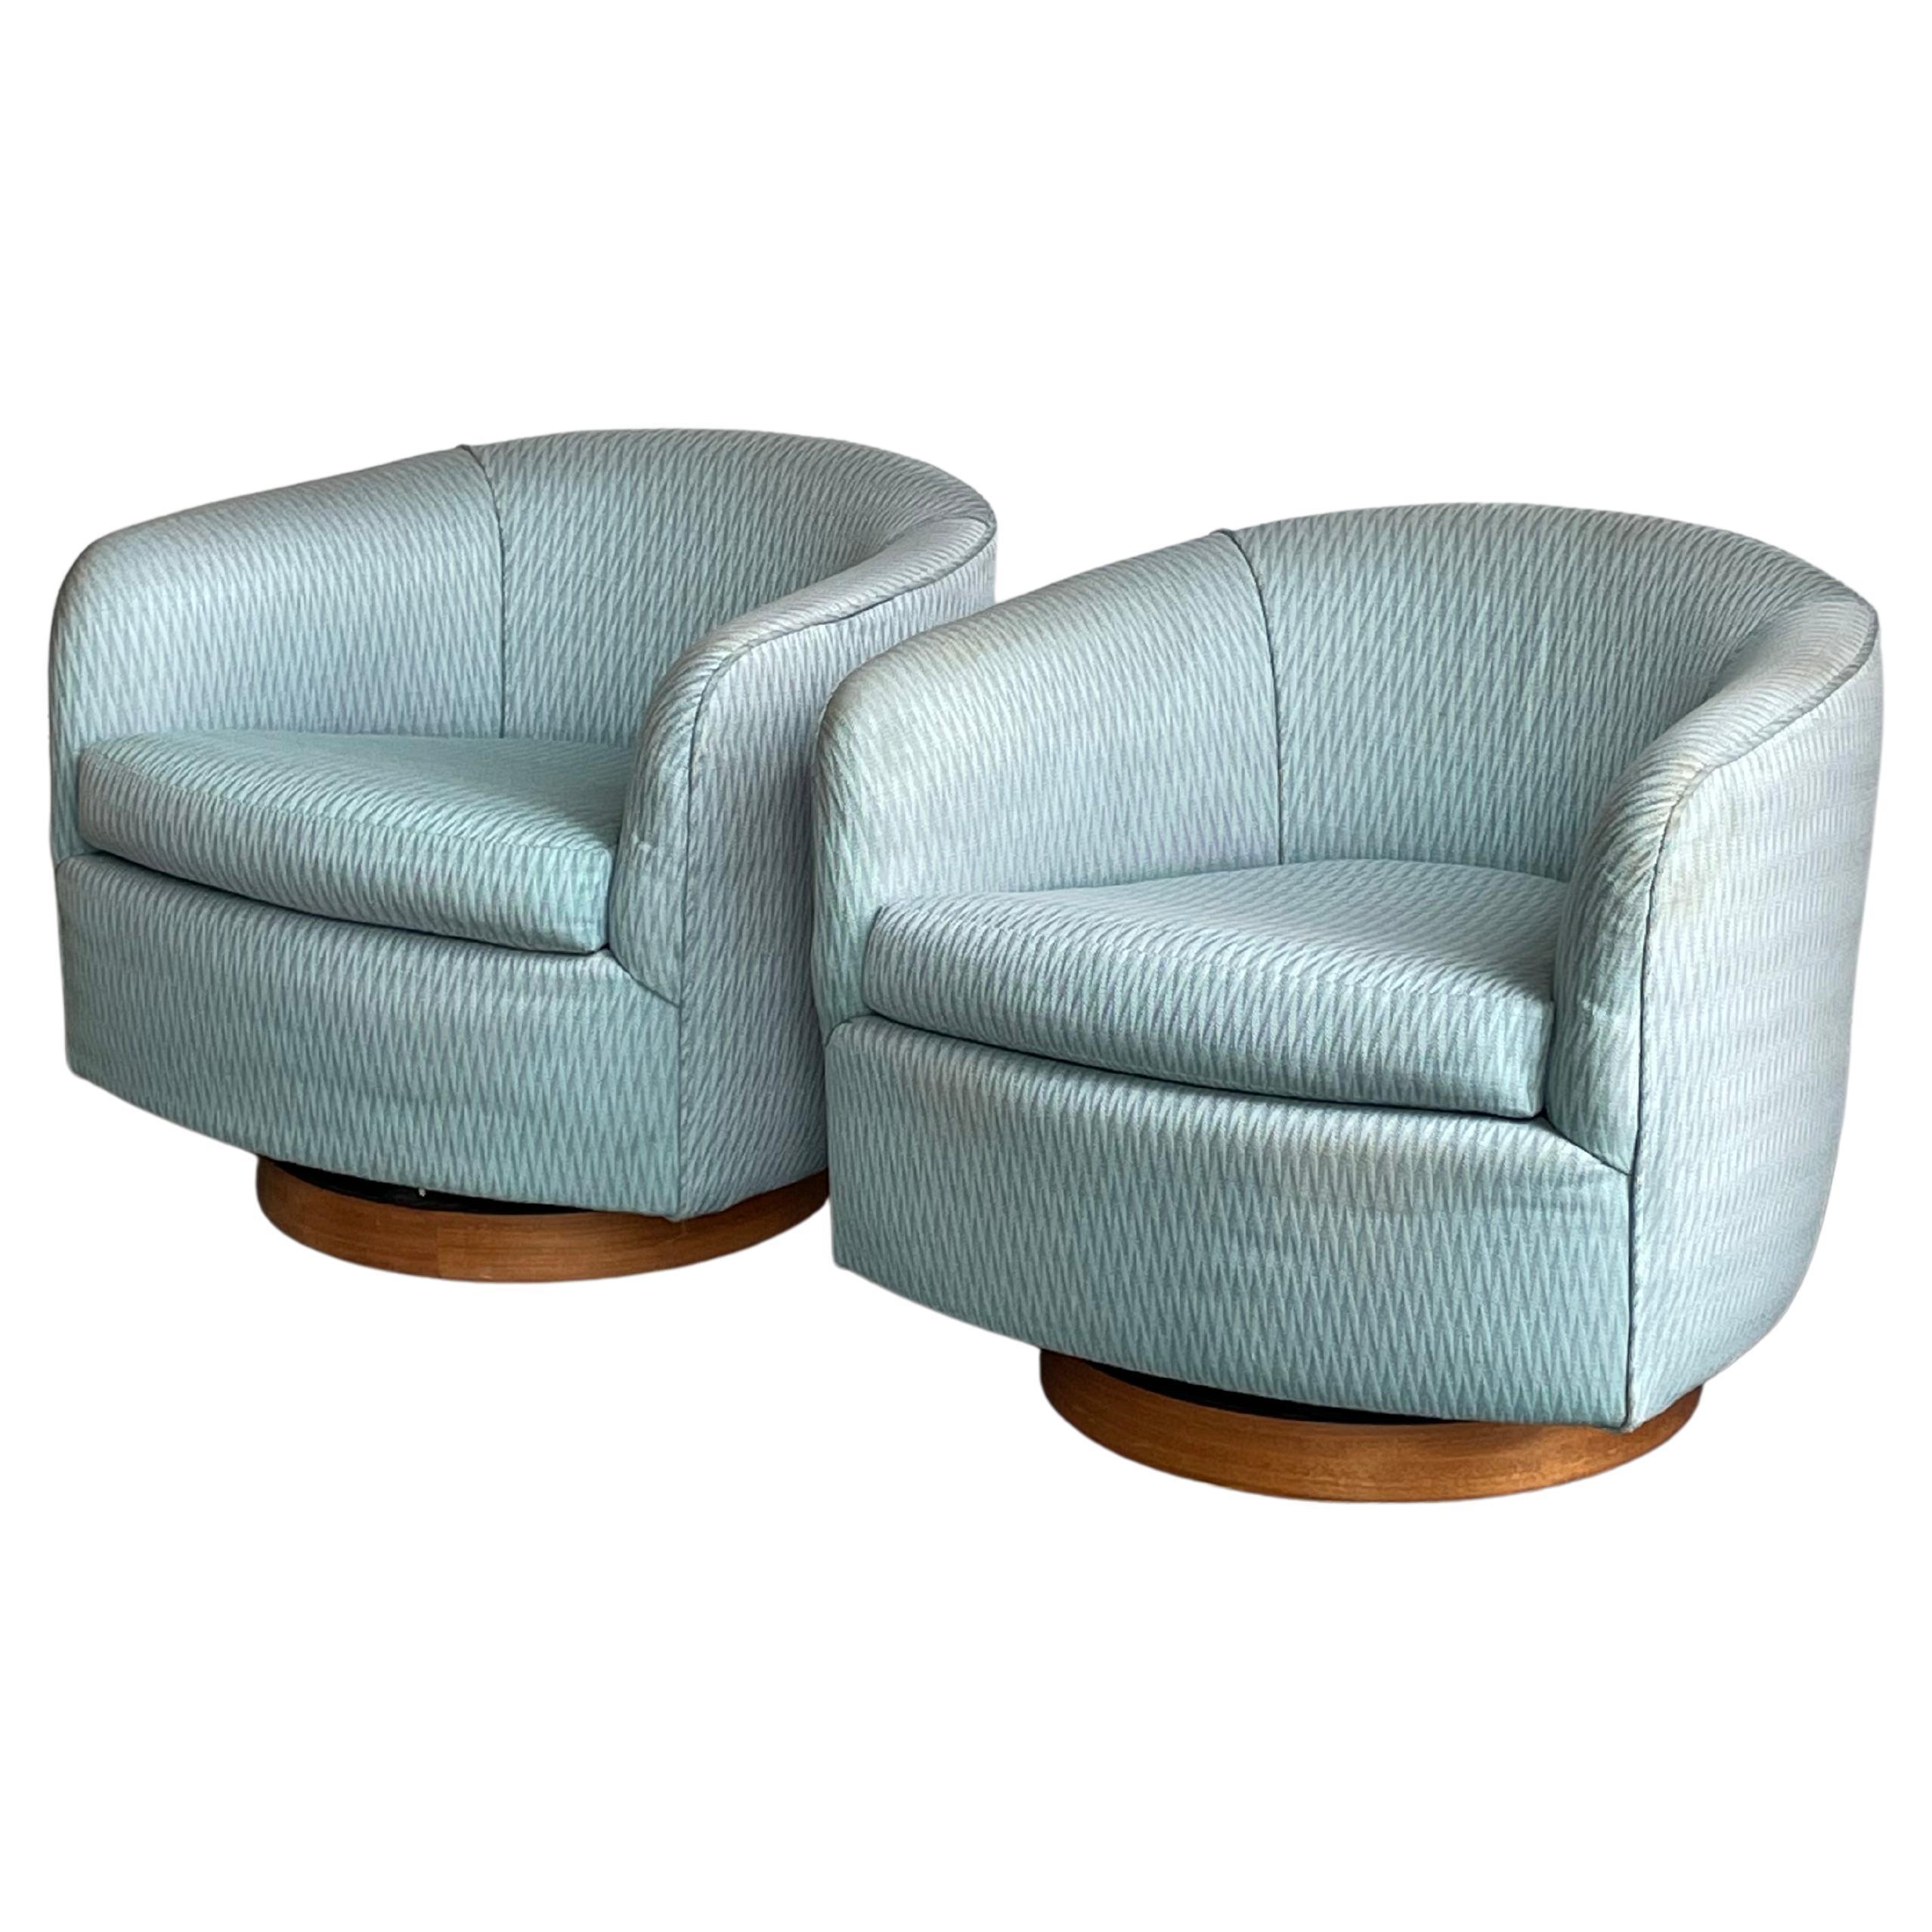 Milo Baughman Swivel and Tilt Club Chairs